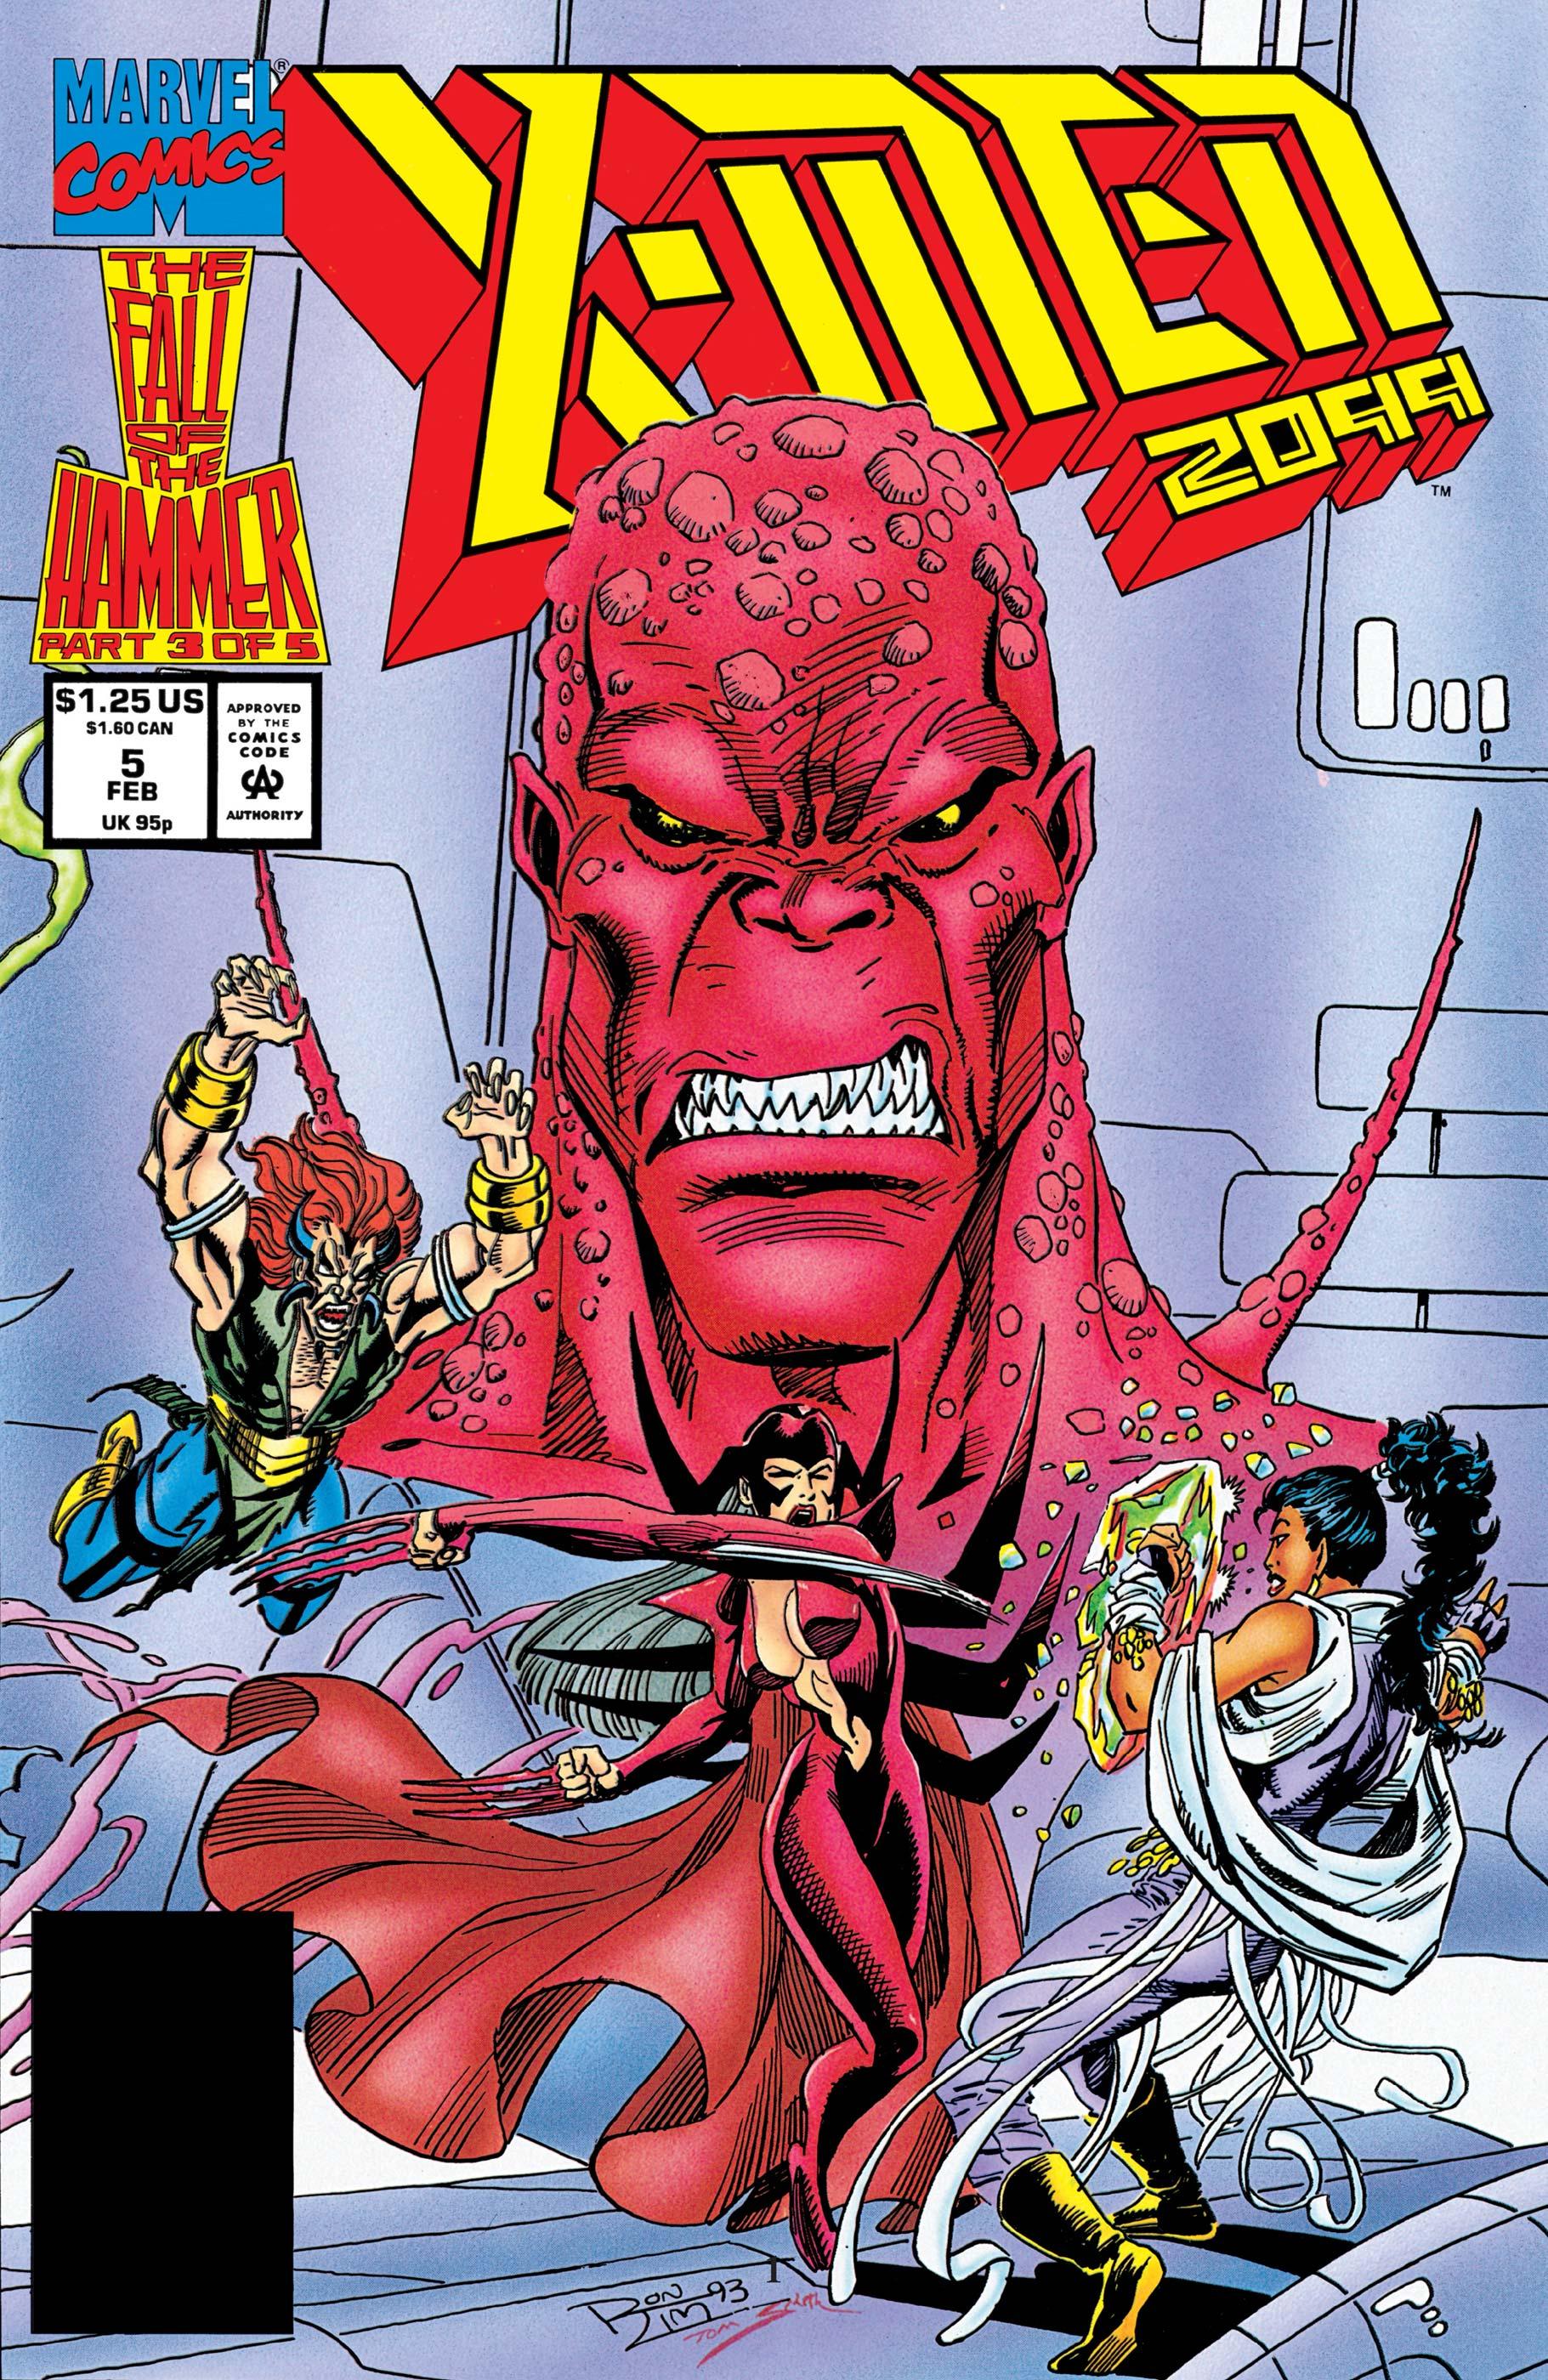 X-Men 2099 (1993) #5